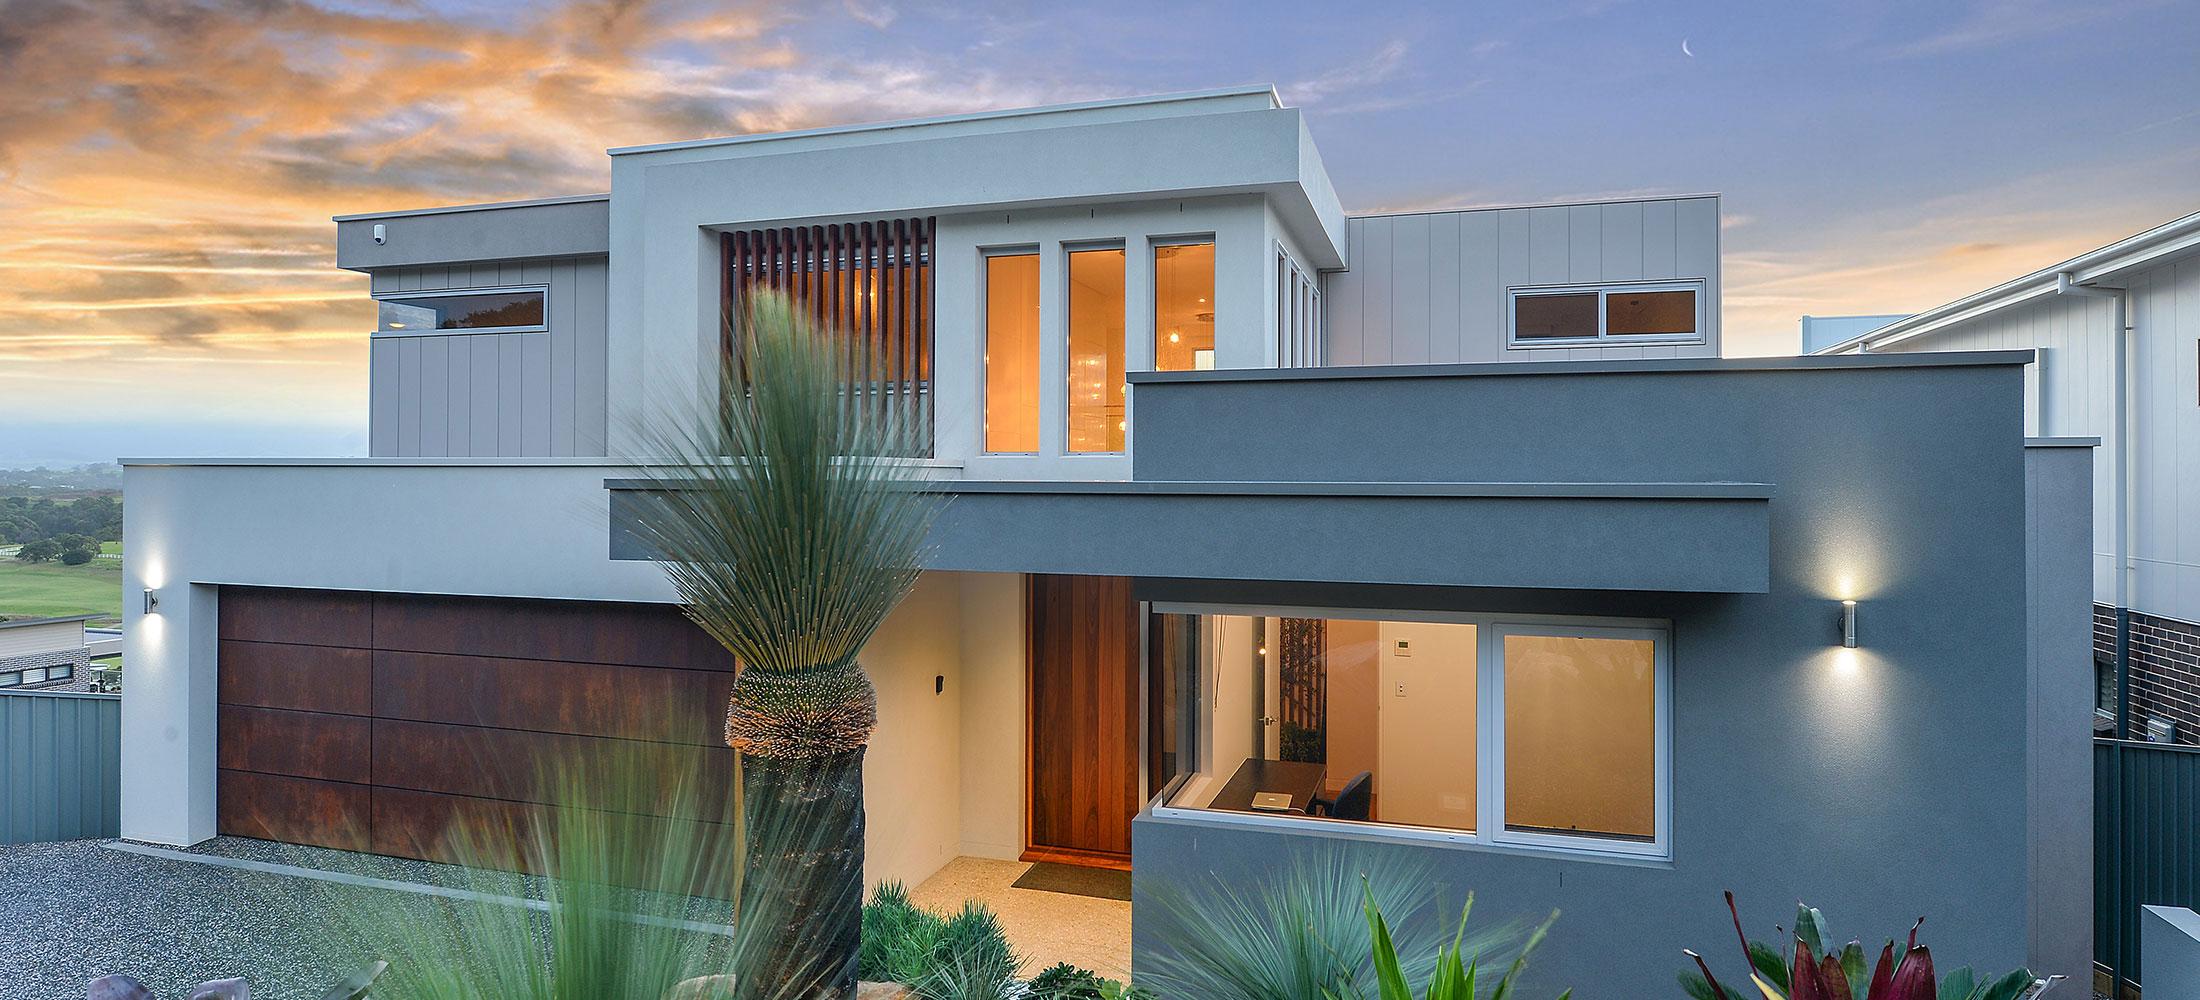 Wollongong Draftsman Drafting House Designs House Plans